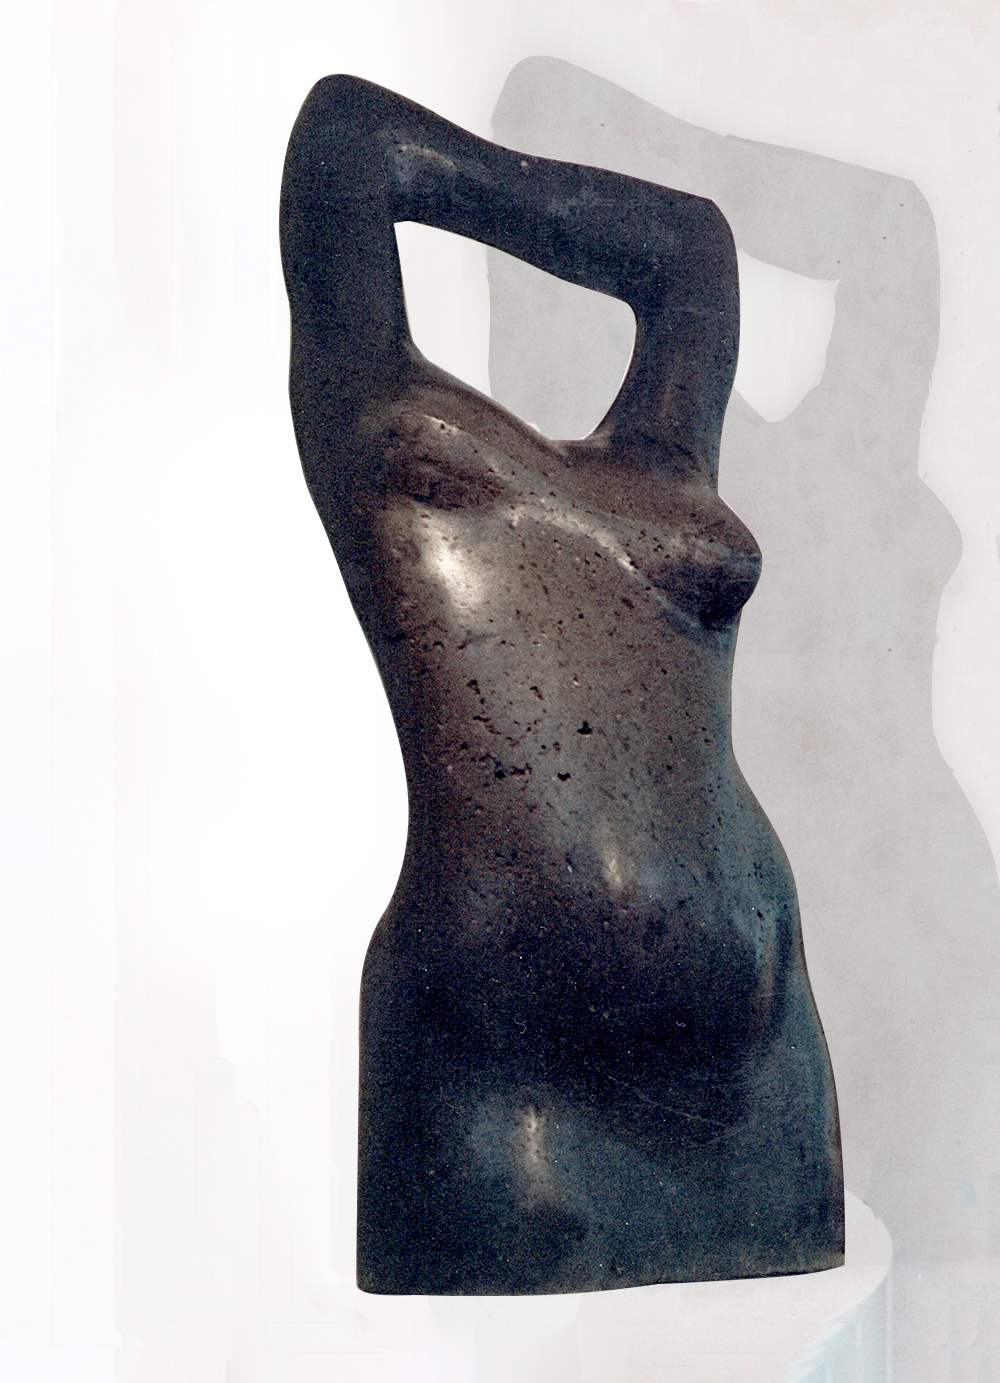 Escultura-Torso-Femenino-Basalto-C-Figurativo-Abstracto-RD.Escultor